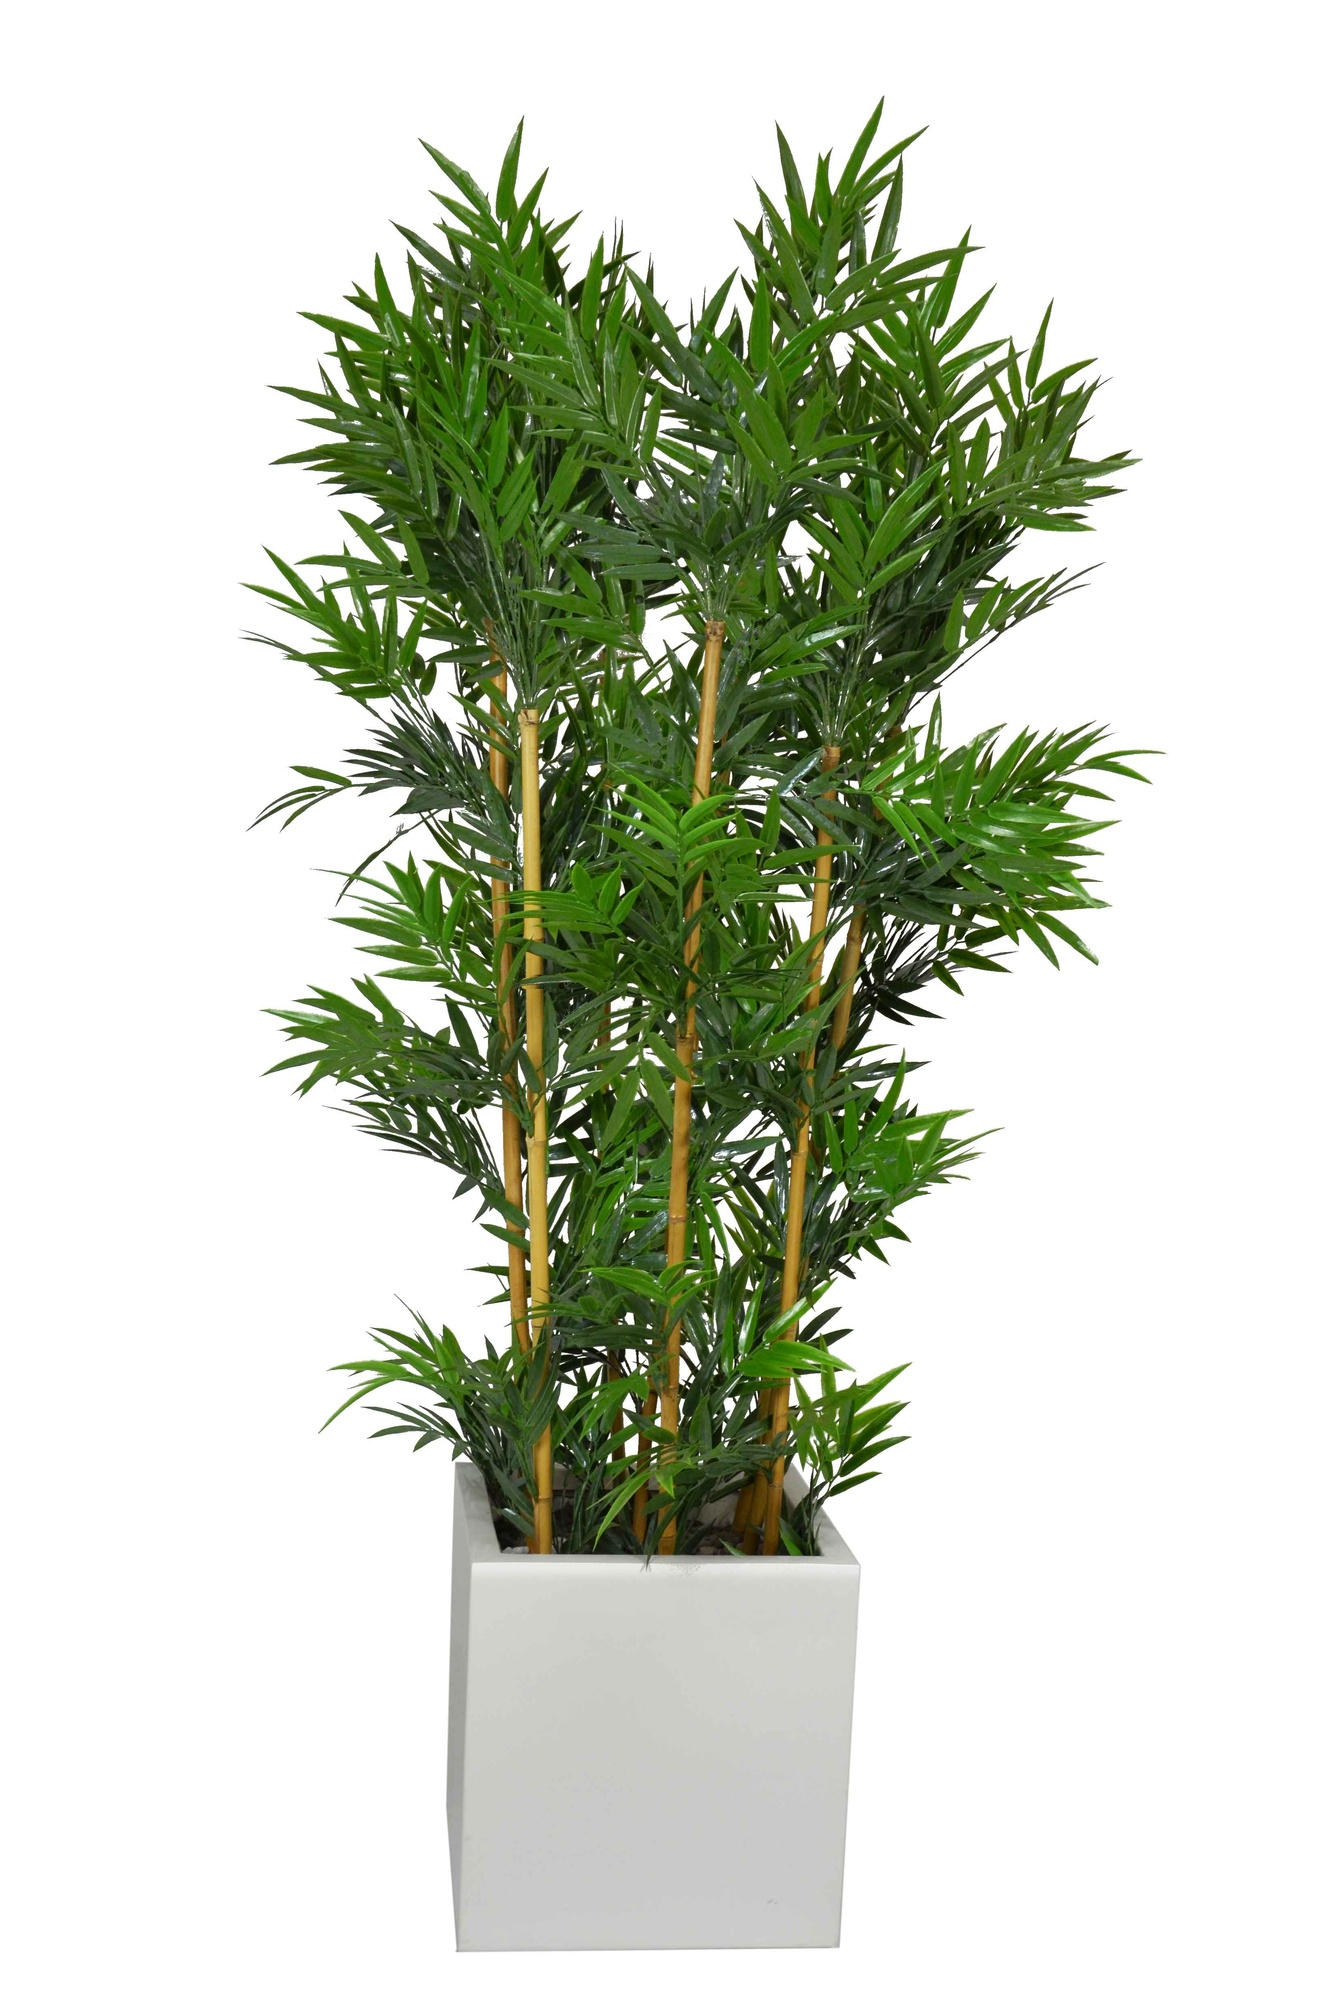 Piante Artificiali Da Esterno : Bamboo piante artificiali da esterno interno viridium